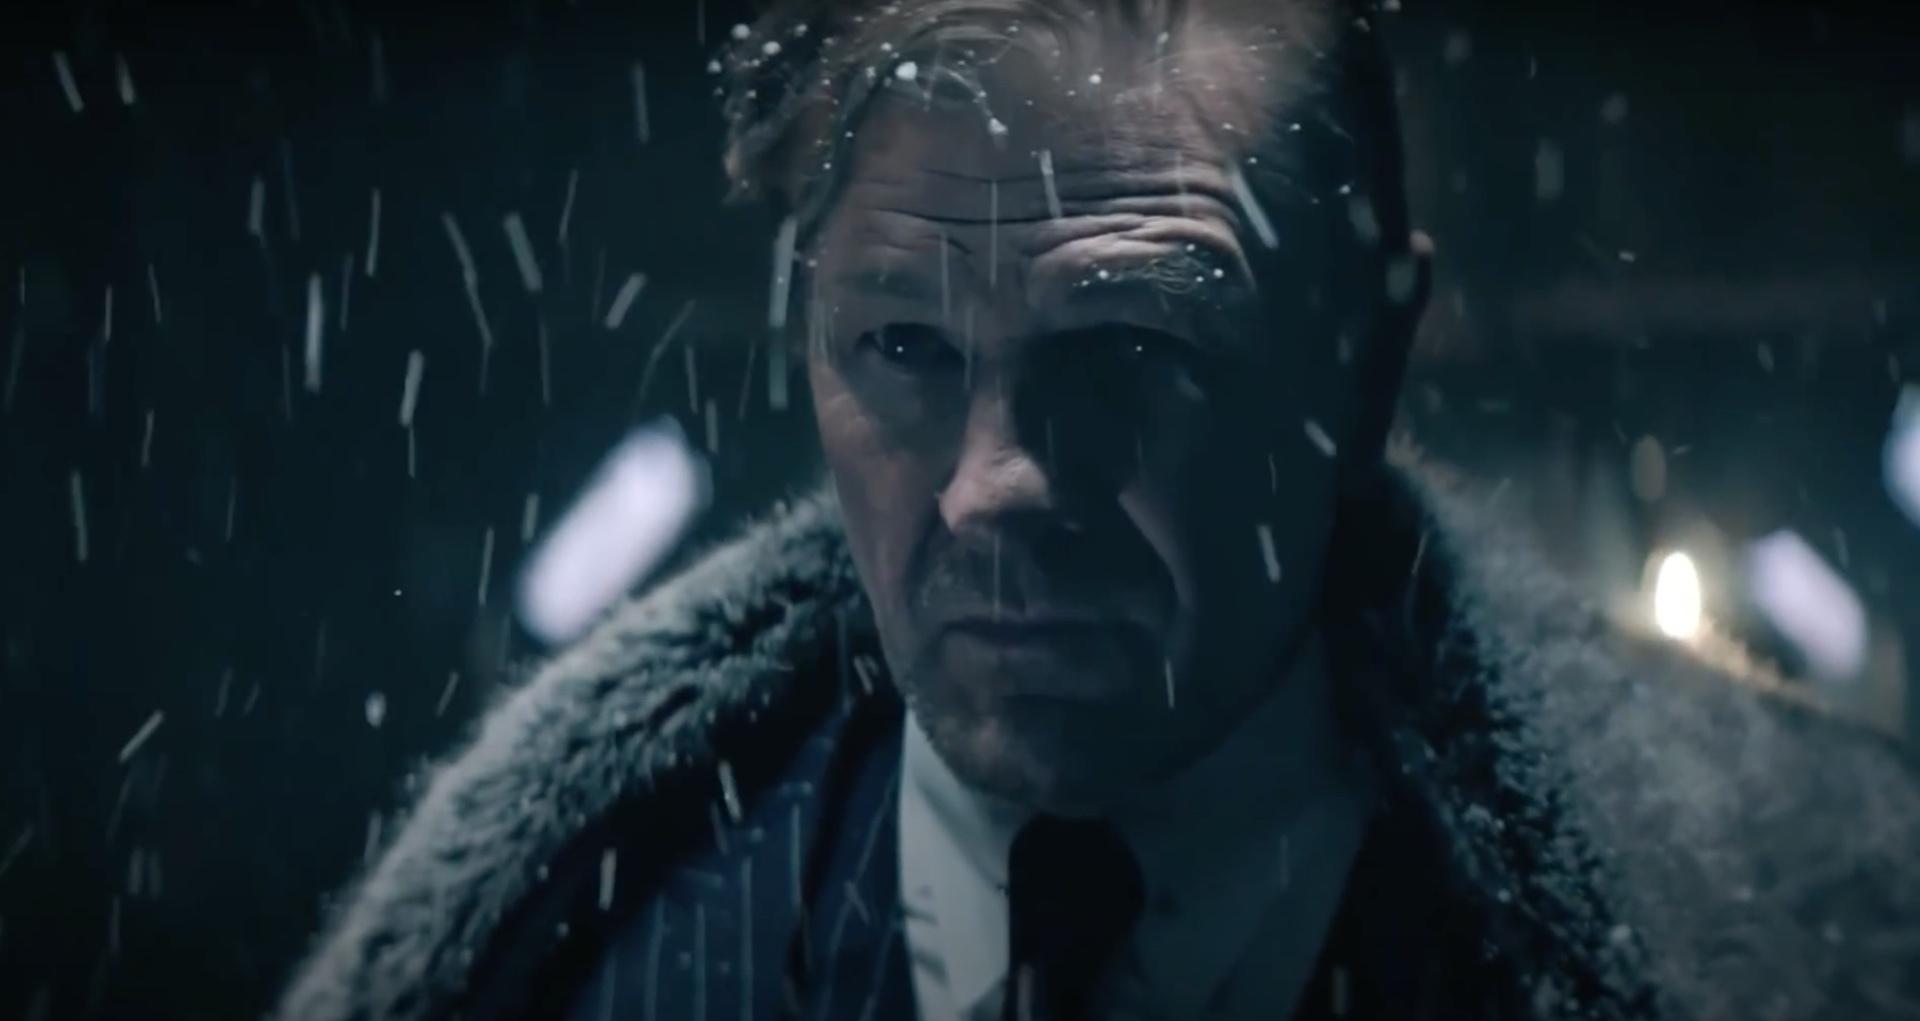 Трейлер: Сквозь снег, 2 сезон (Snowpiercer, season 2)